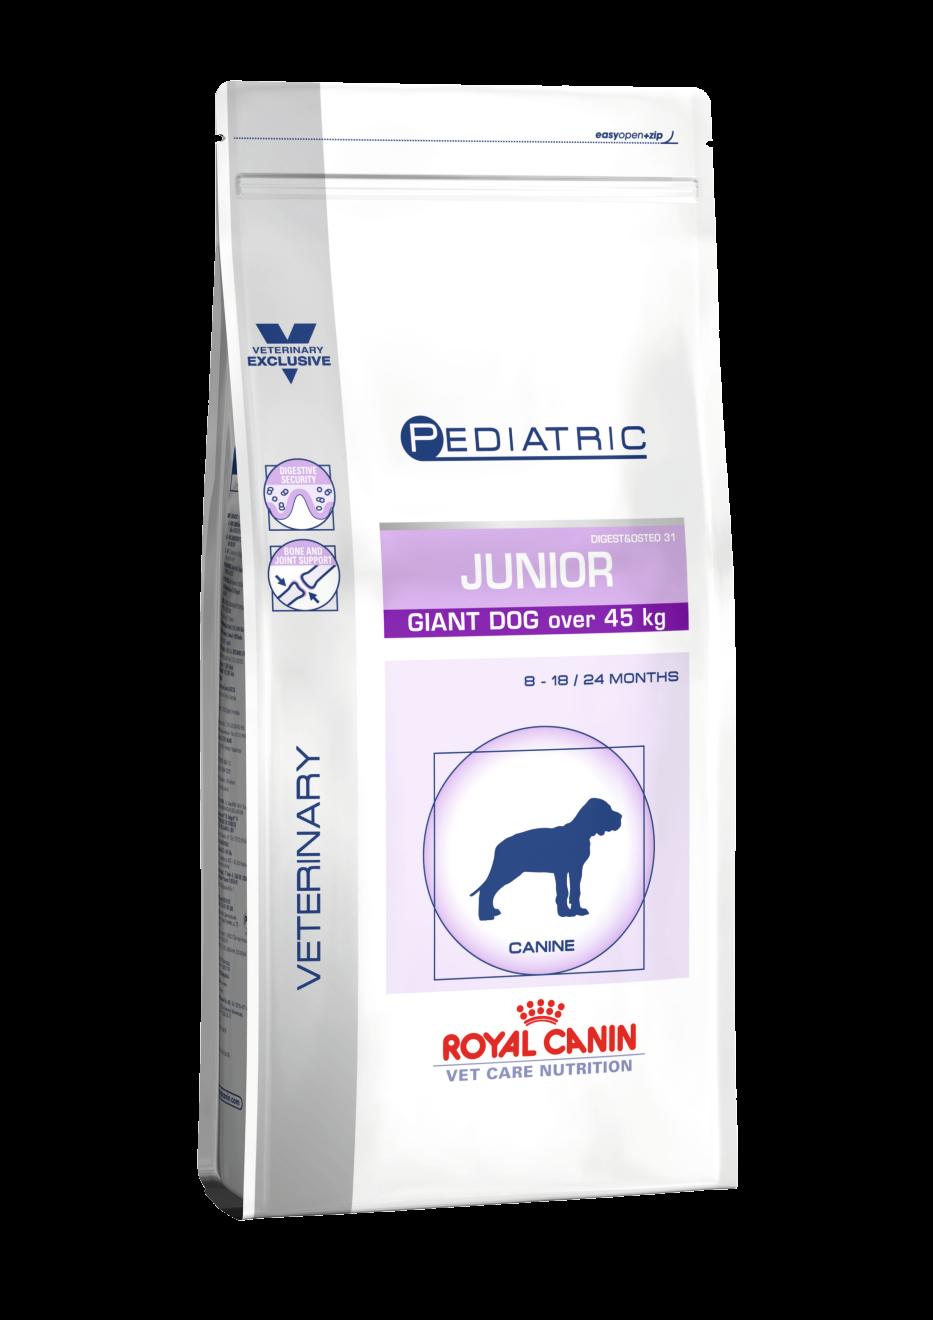 Pediatric Junior Giant Dog product image